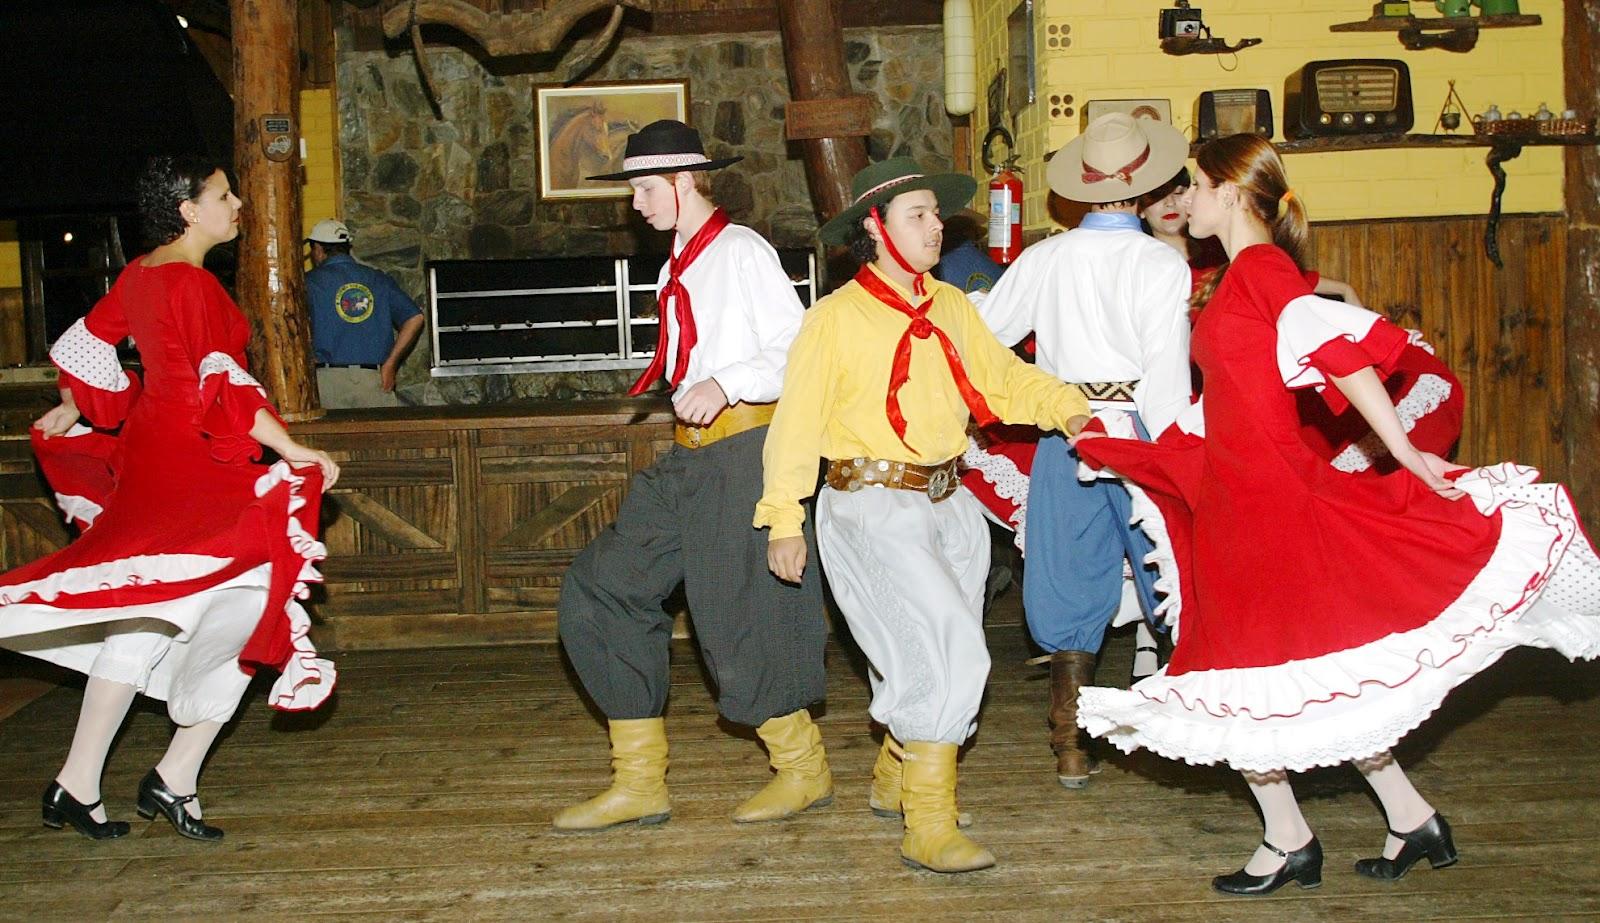 Dança Tradicional Portuguesa Forma Tradicional é Dança